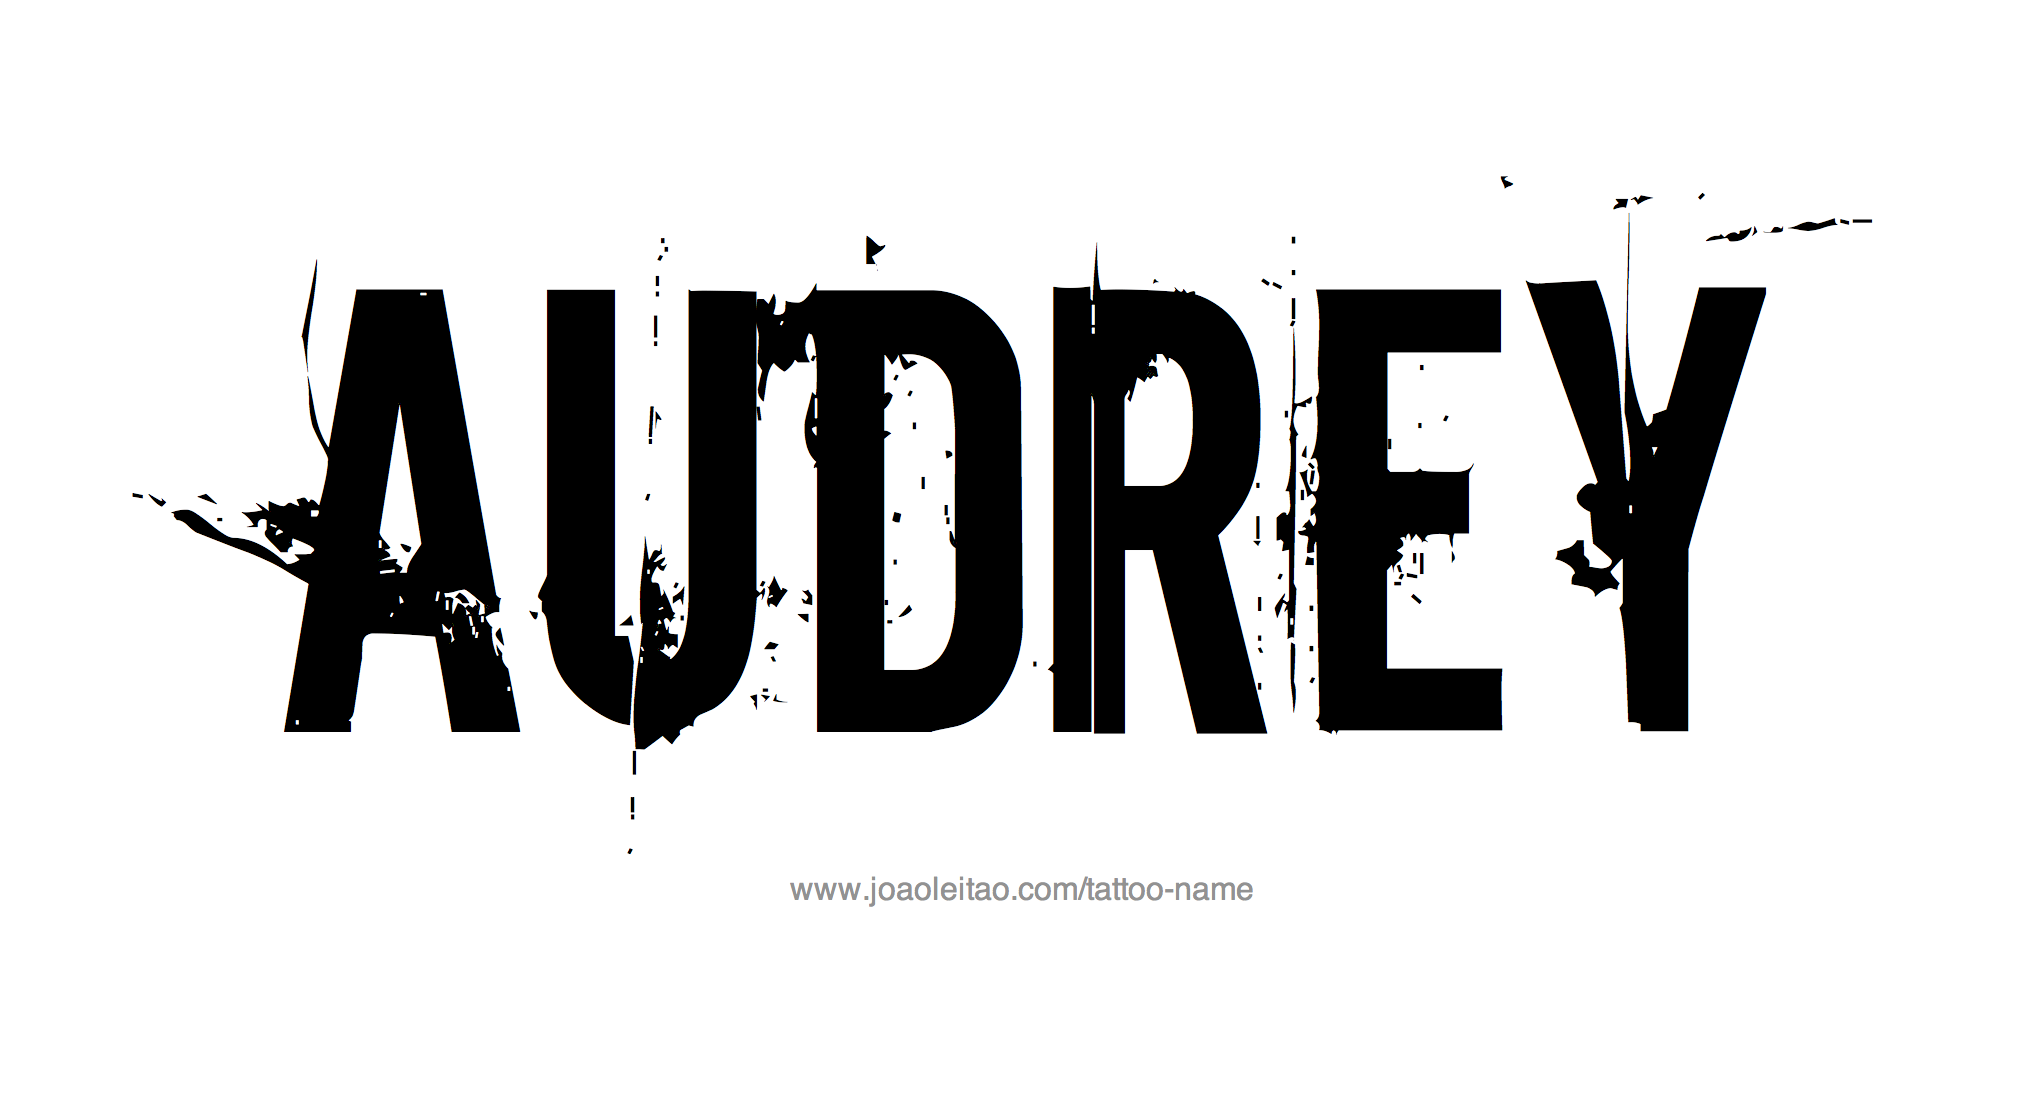 audrey name tattoo designs